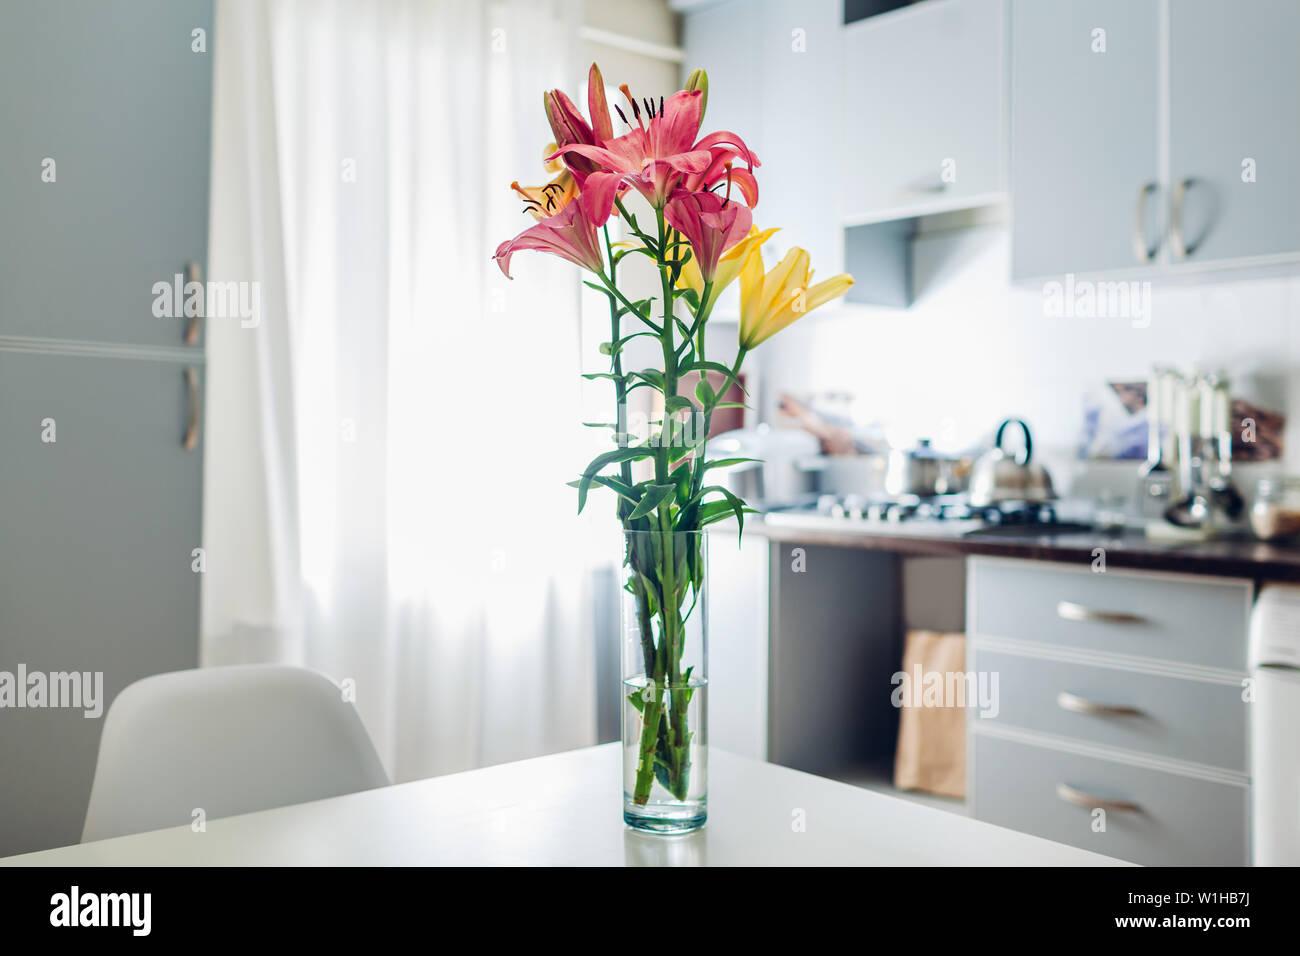 Colorful Lilies Modern Kitchen Design Interior Of White